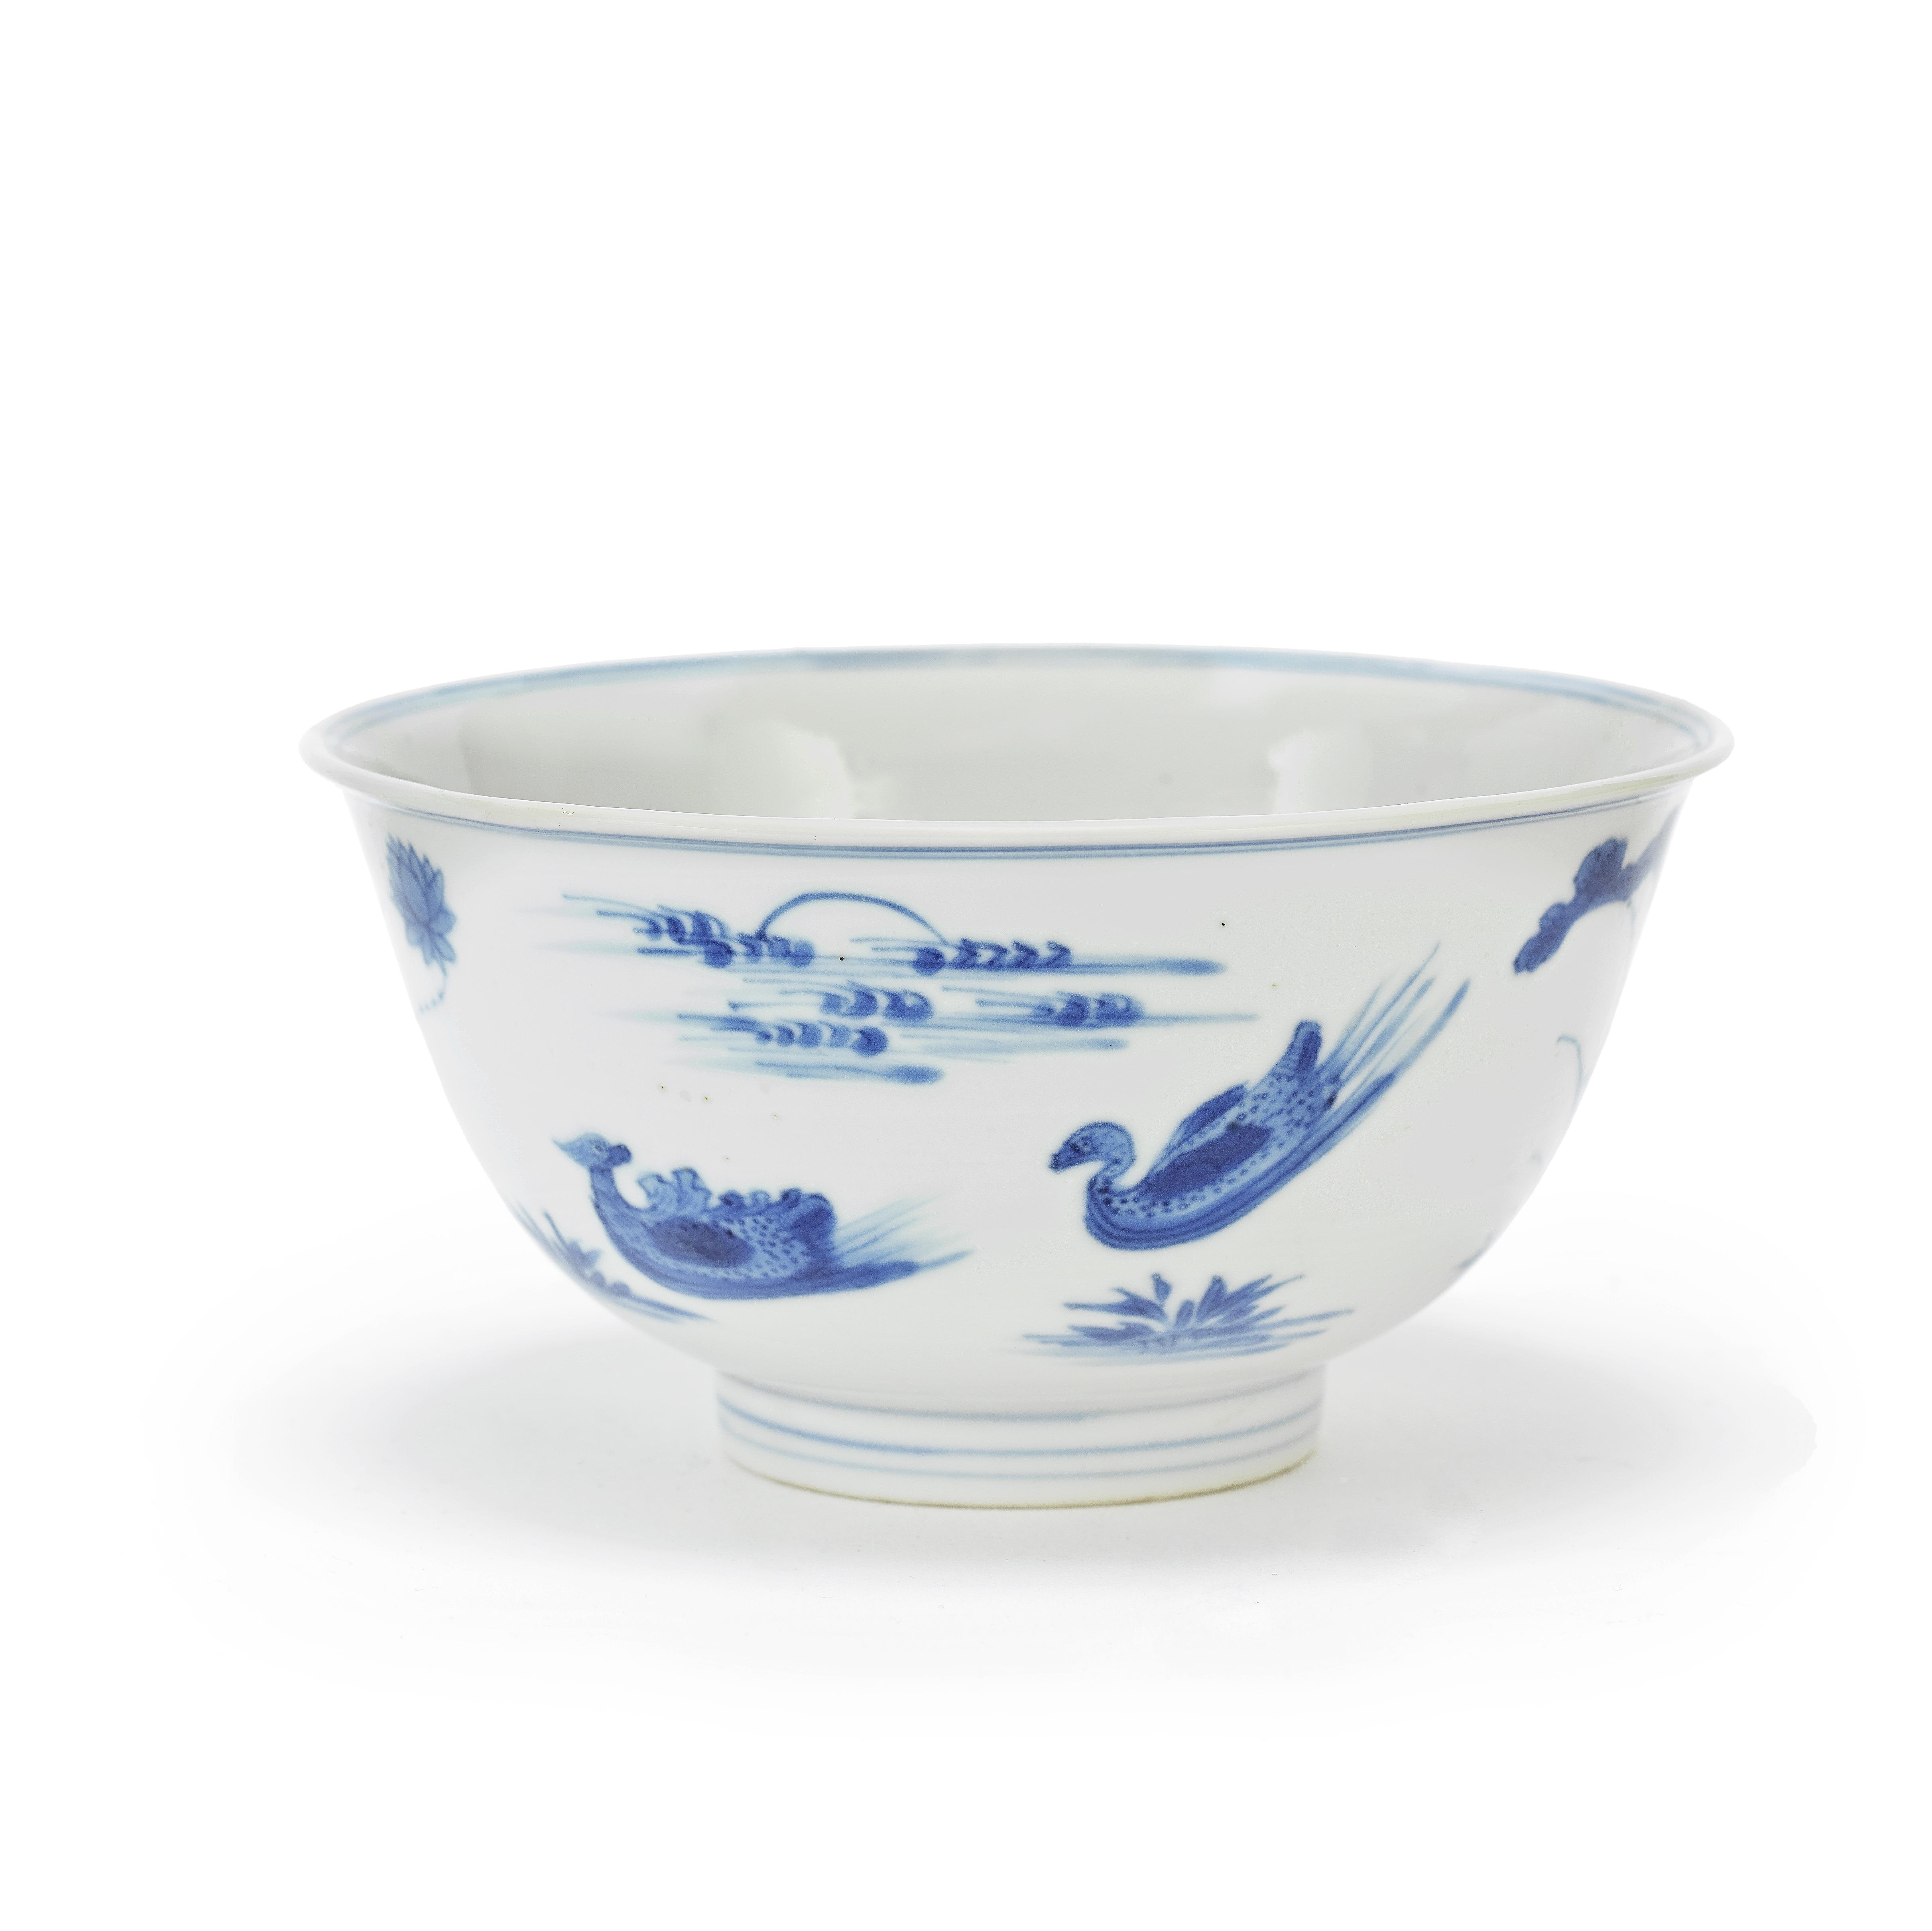 A BLUE AND WHITE 'DUCKS' BOWL Chenghua six-character mark, Kangxi